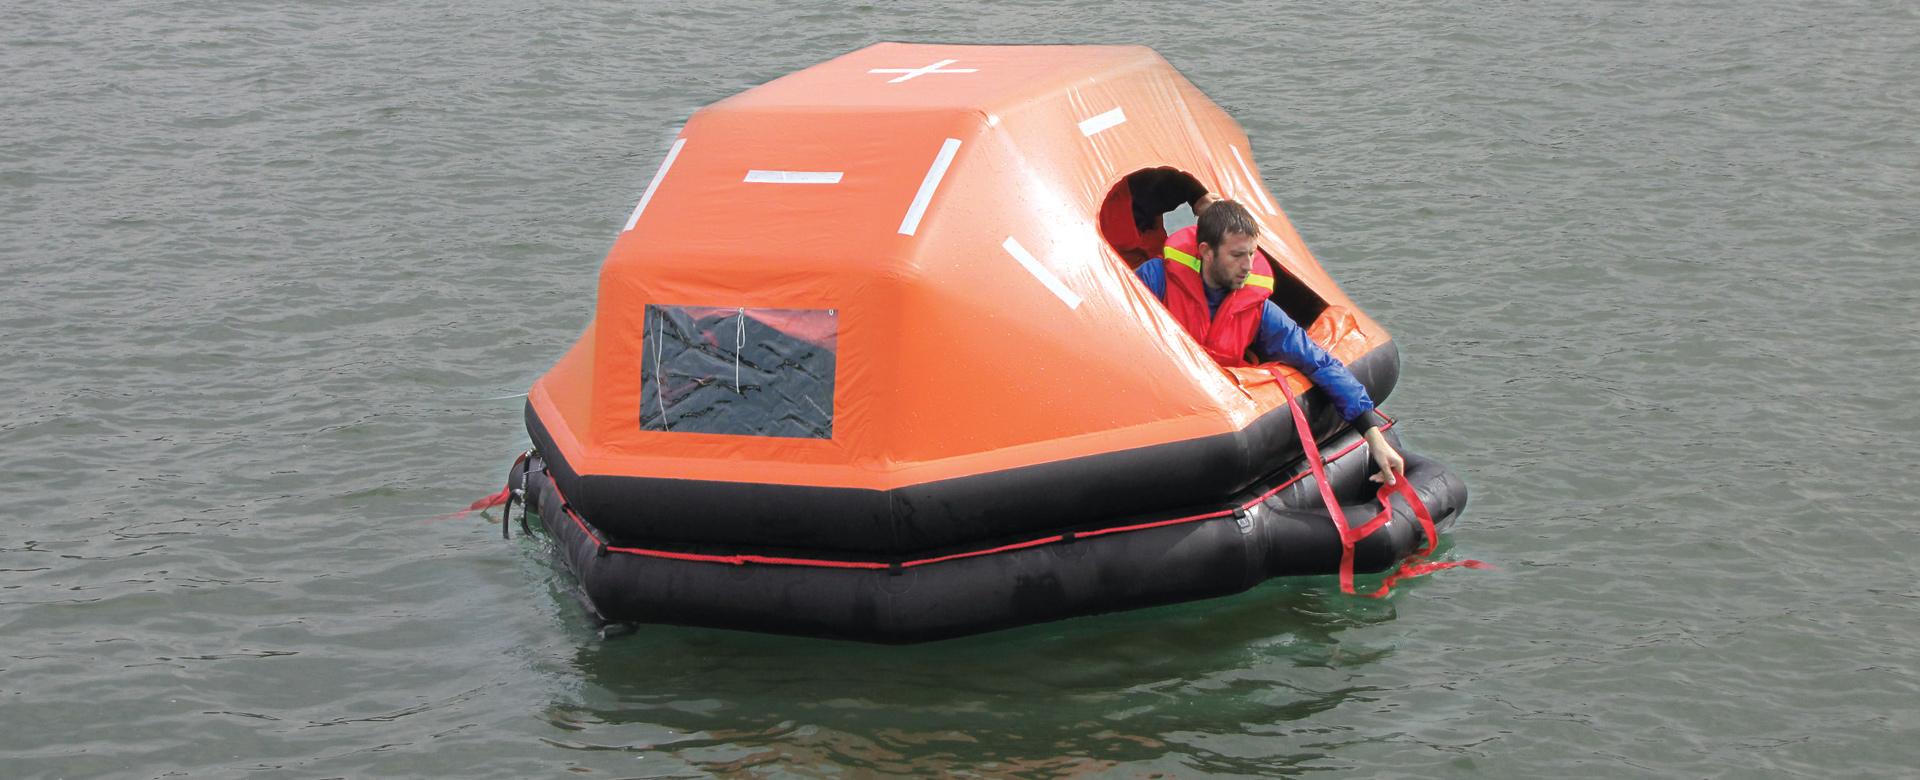 life-raft-slide-00-01